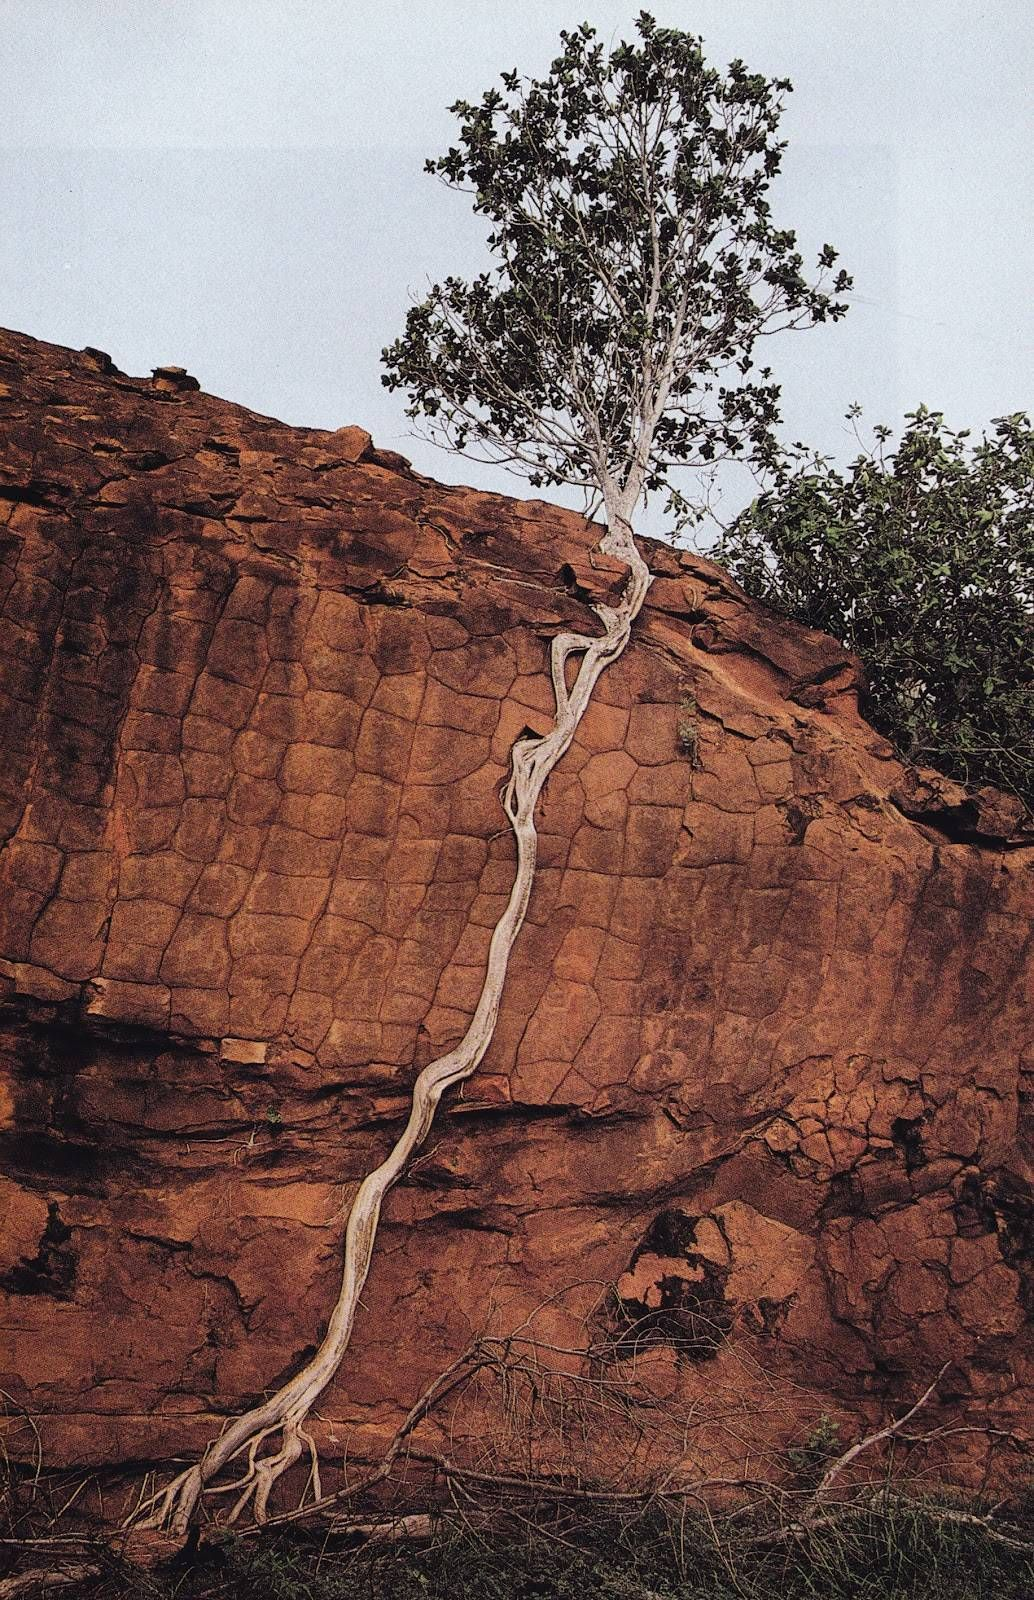 Arbre racine insolite pinterest arbres remarquables pinterest et insolite - Arbre sans racine envahissante ...